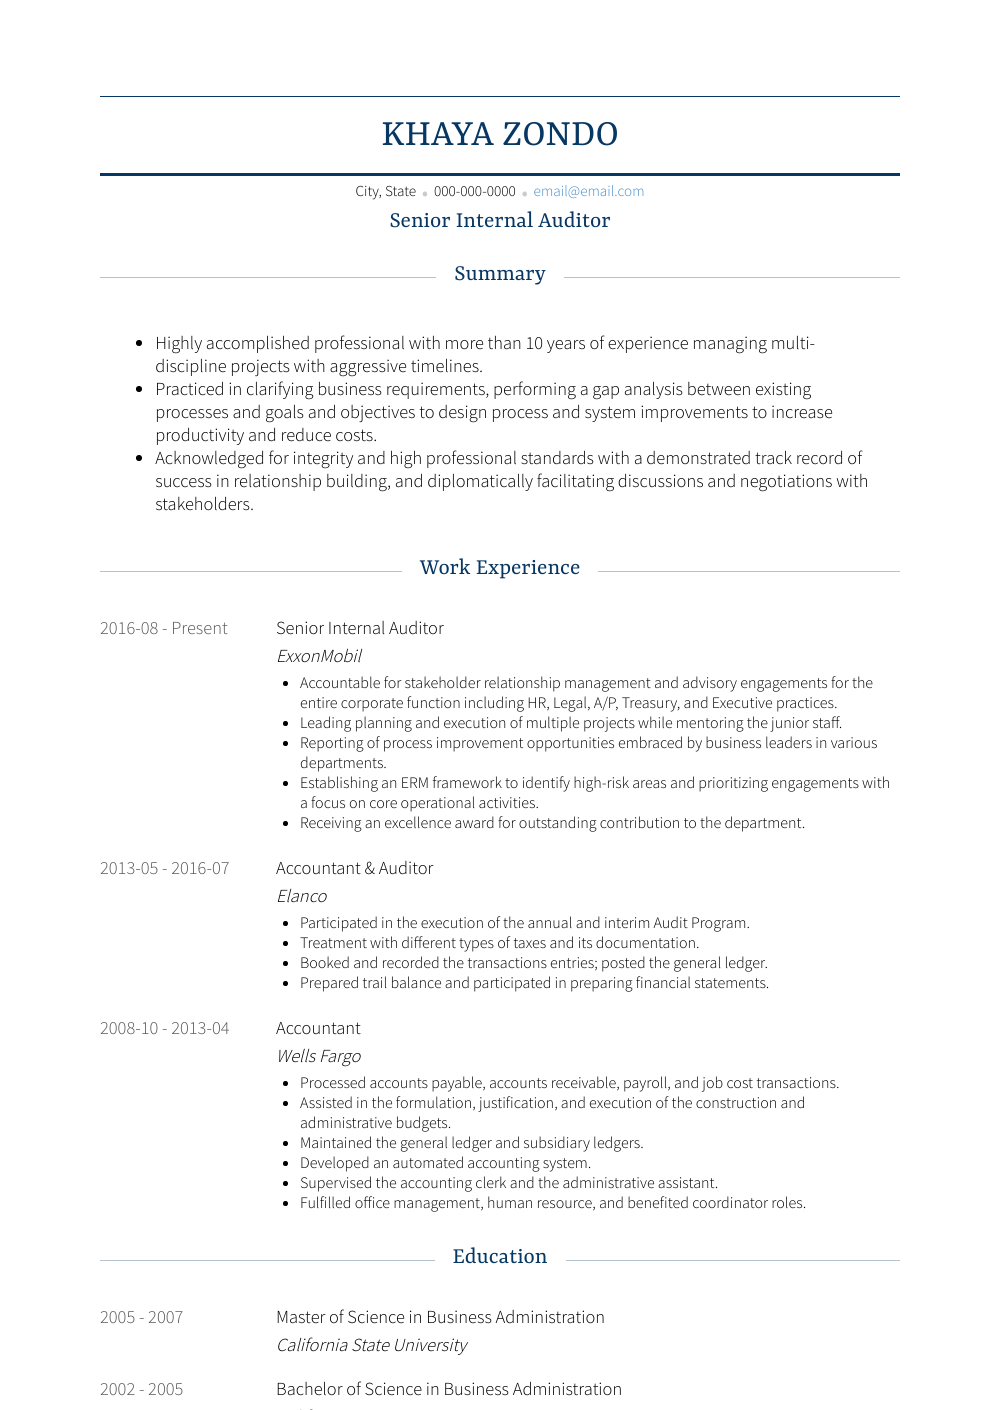 Senior Internal Auditor Resume Sample and Template